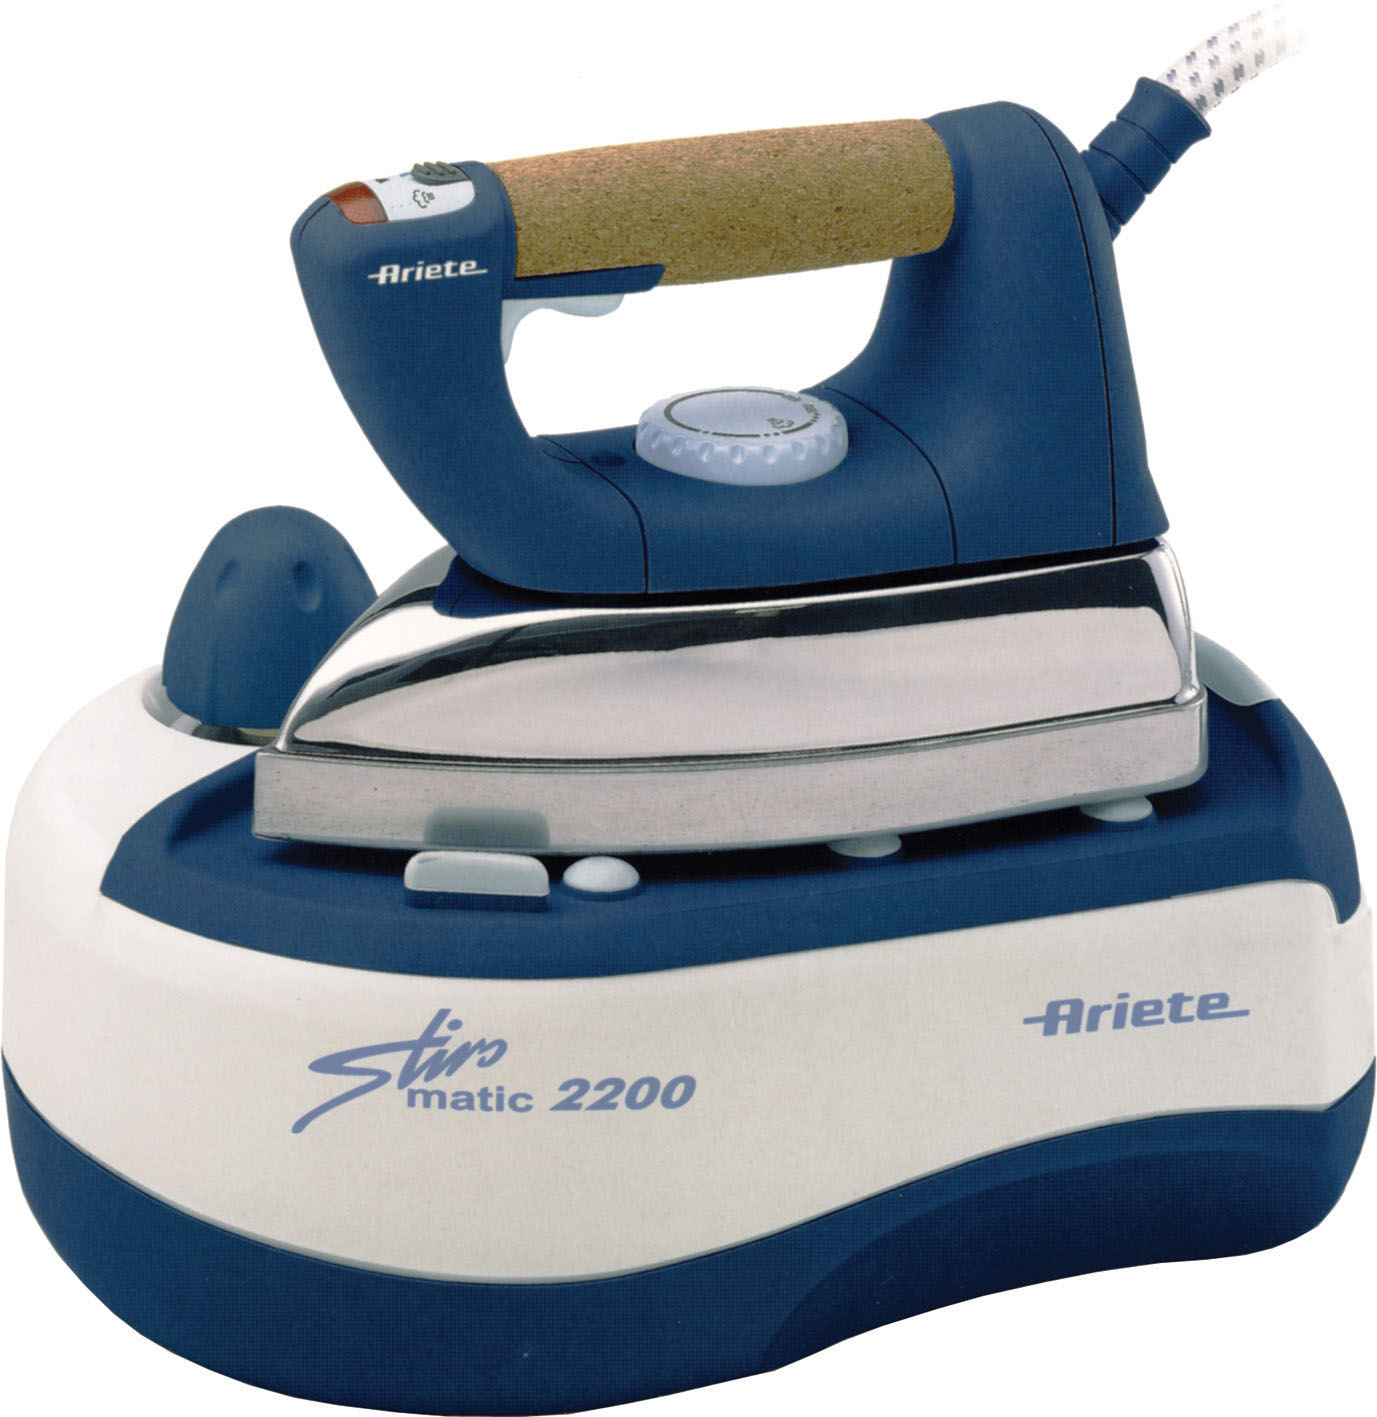 STIRELLA STIROMATIC 2200 ARIET